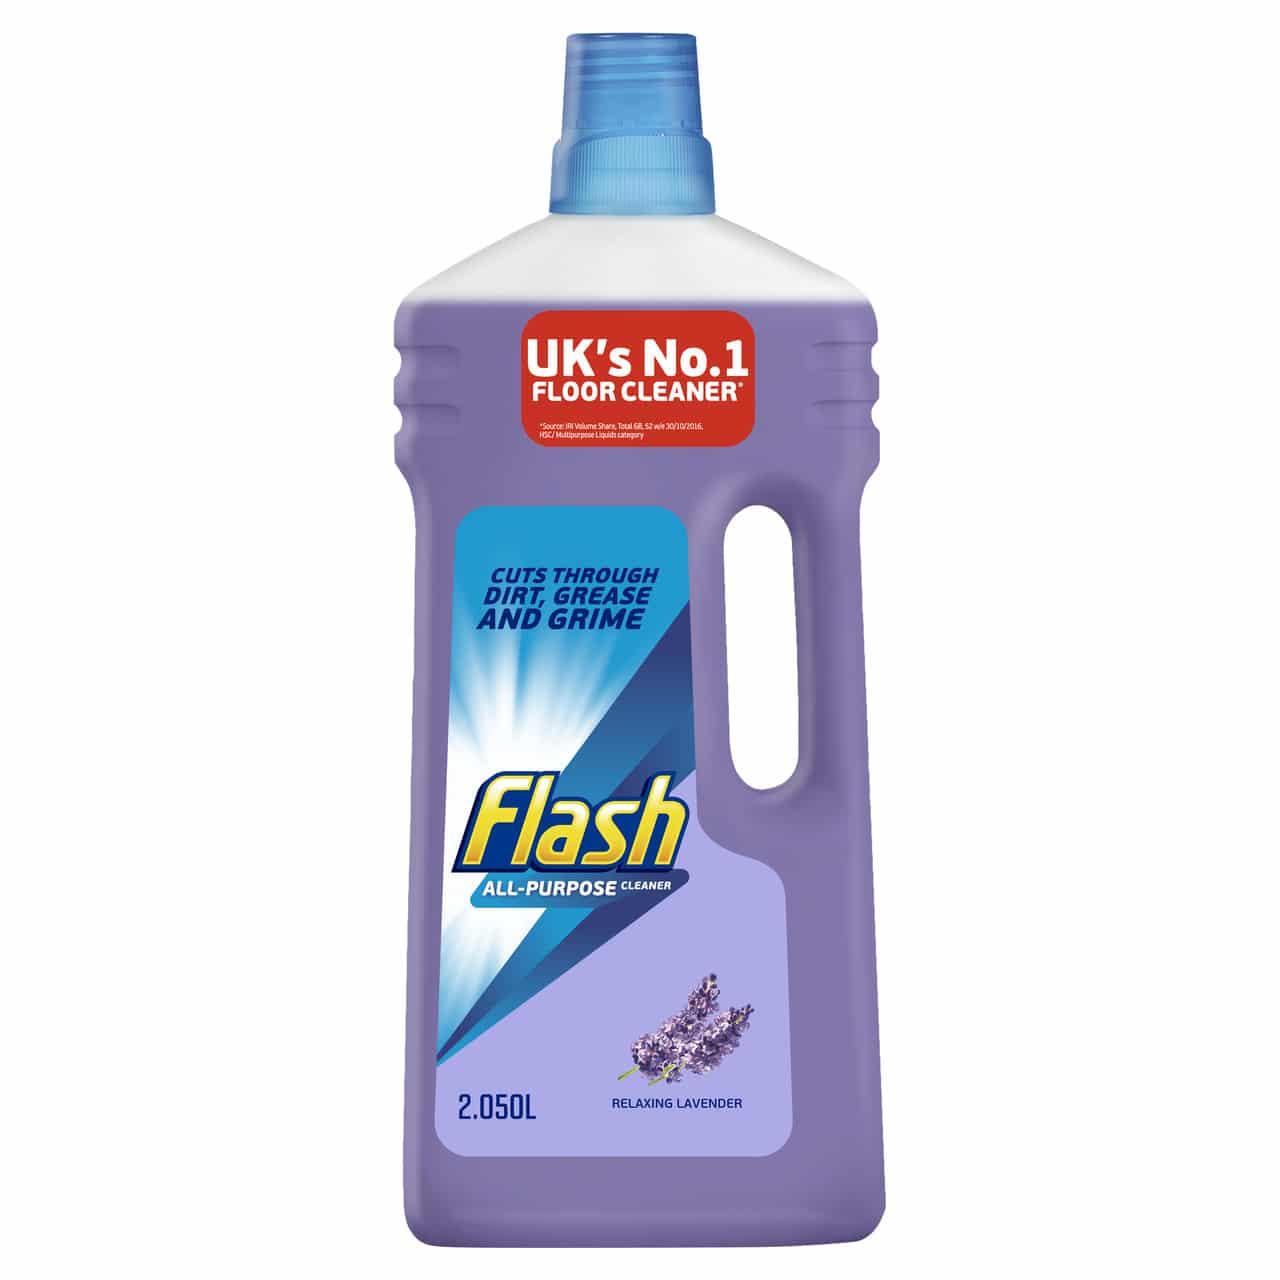 FLASH ALL PURPOSE CLEANER LIQUID  RELAXING LAVANDER 2.05L